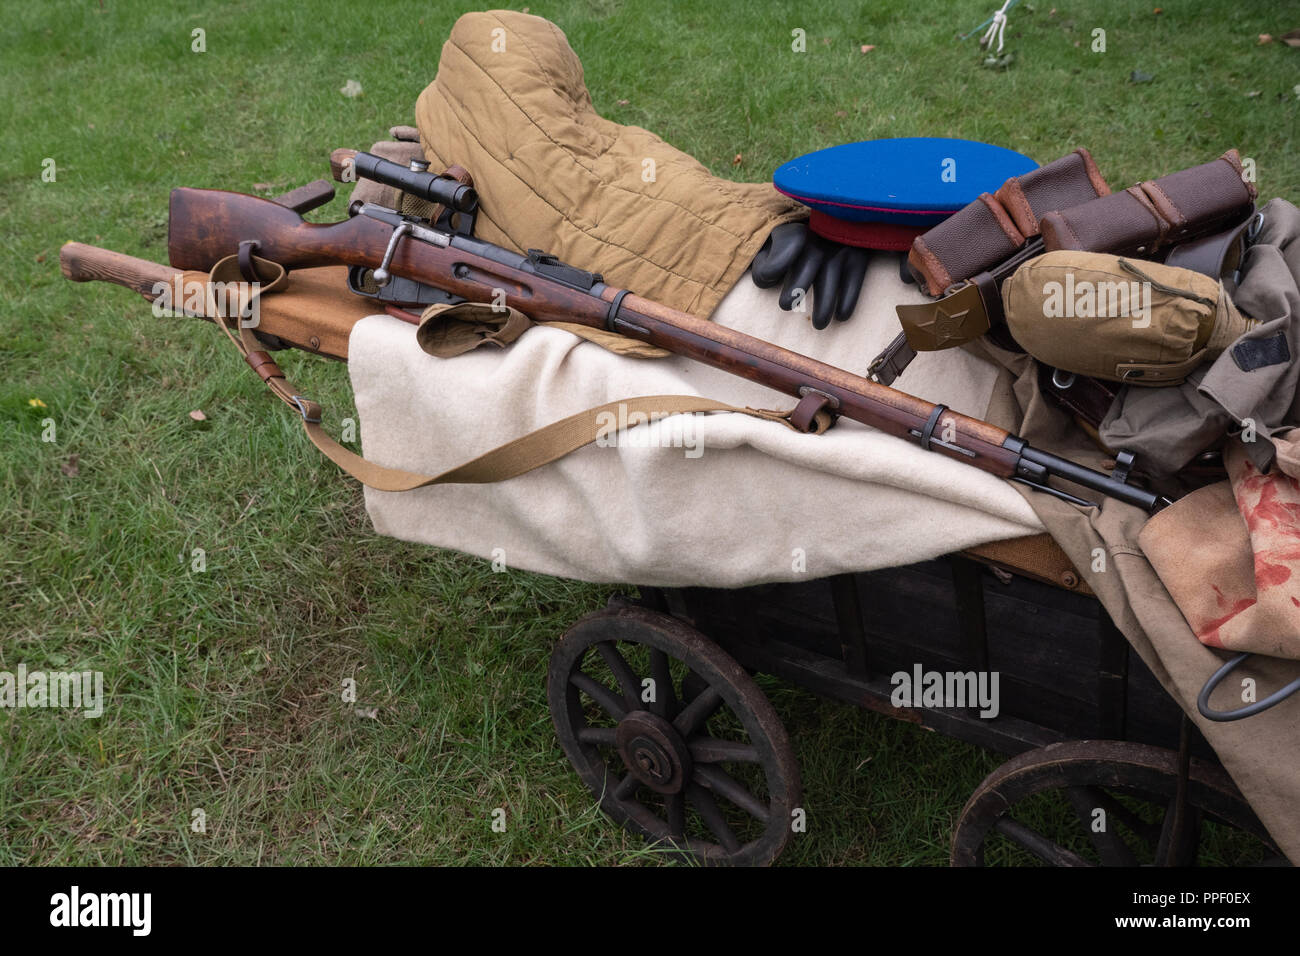 Mosin–Nagant Soviet sniper rifle Stock Photo: 220376546 - Alamy